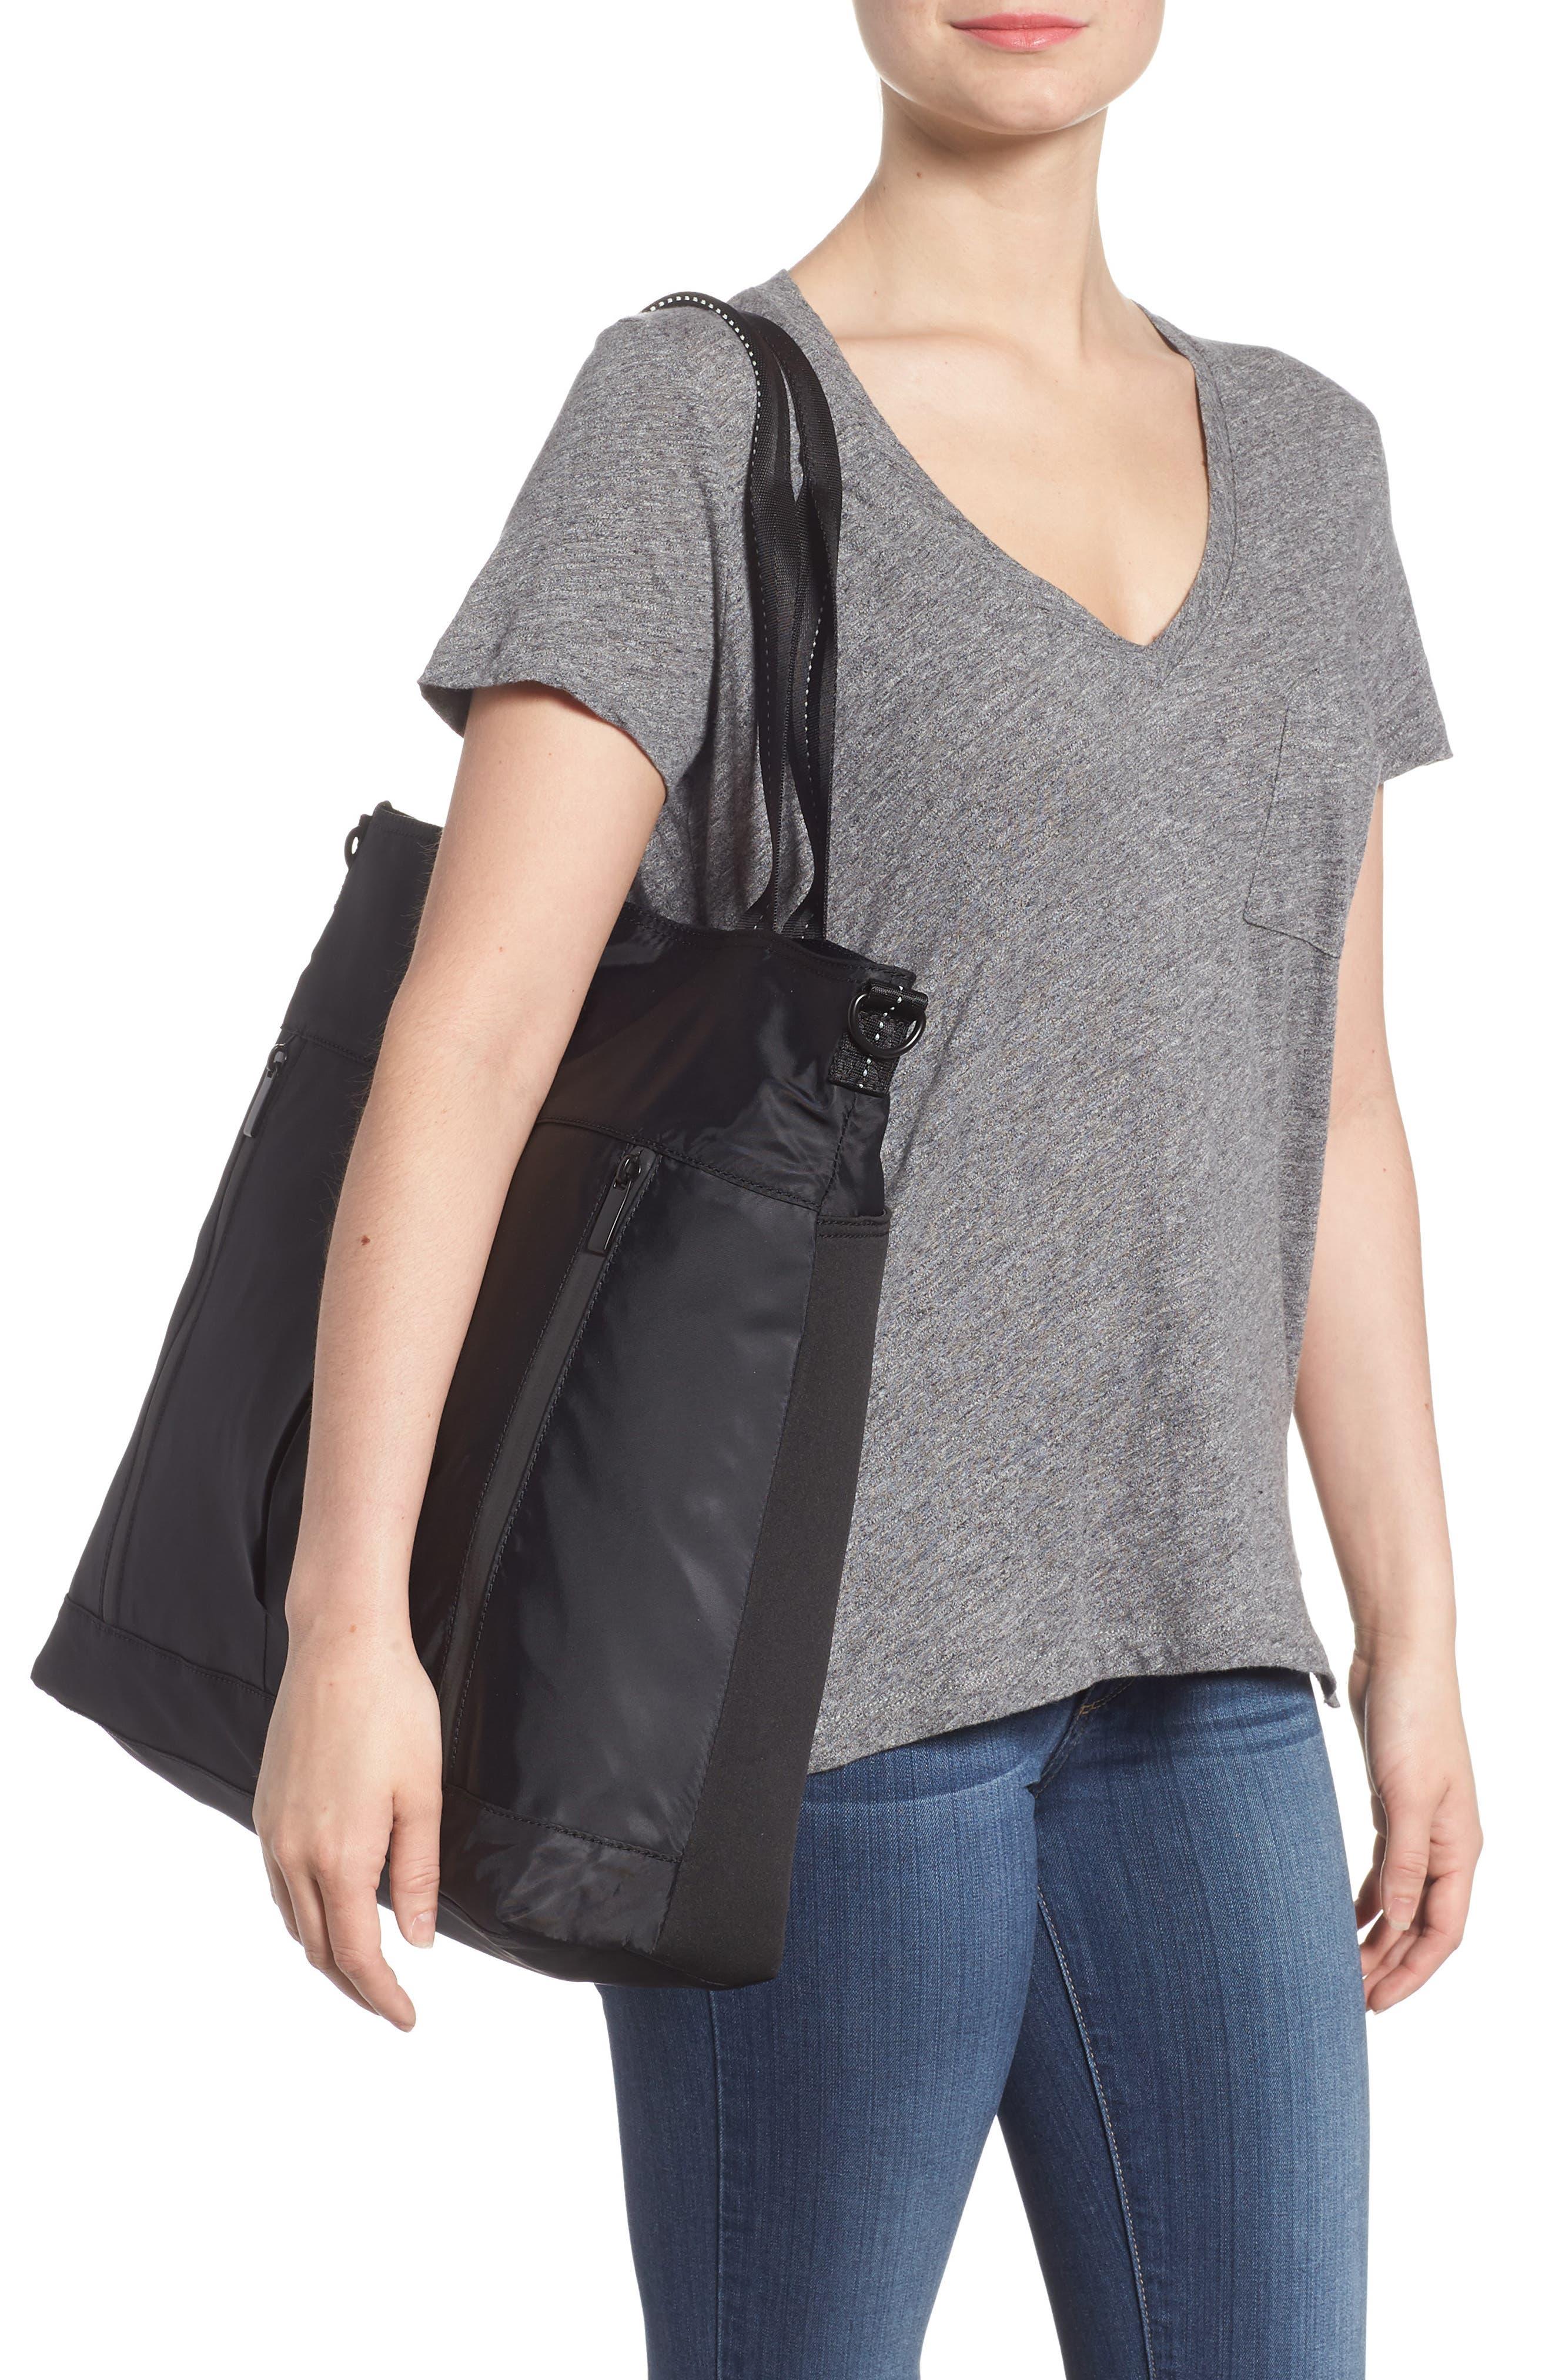 ZELLA,                             Reflective Nylon Tote Bag,                             Alternate thumbnail 2, color,                             BLACK